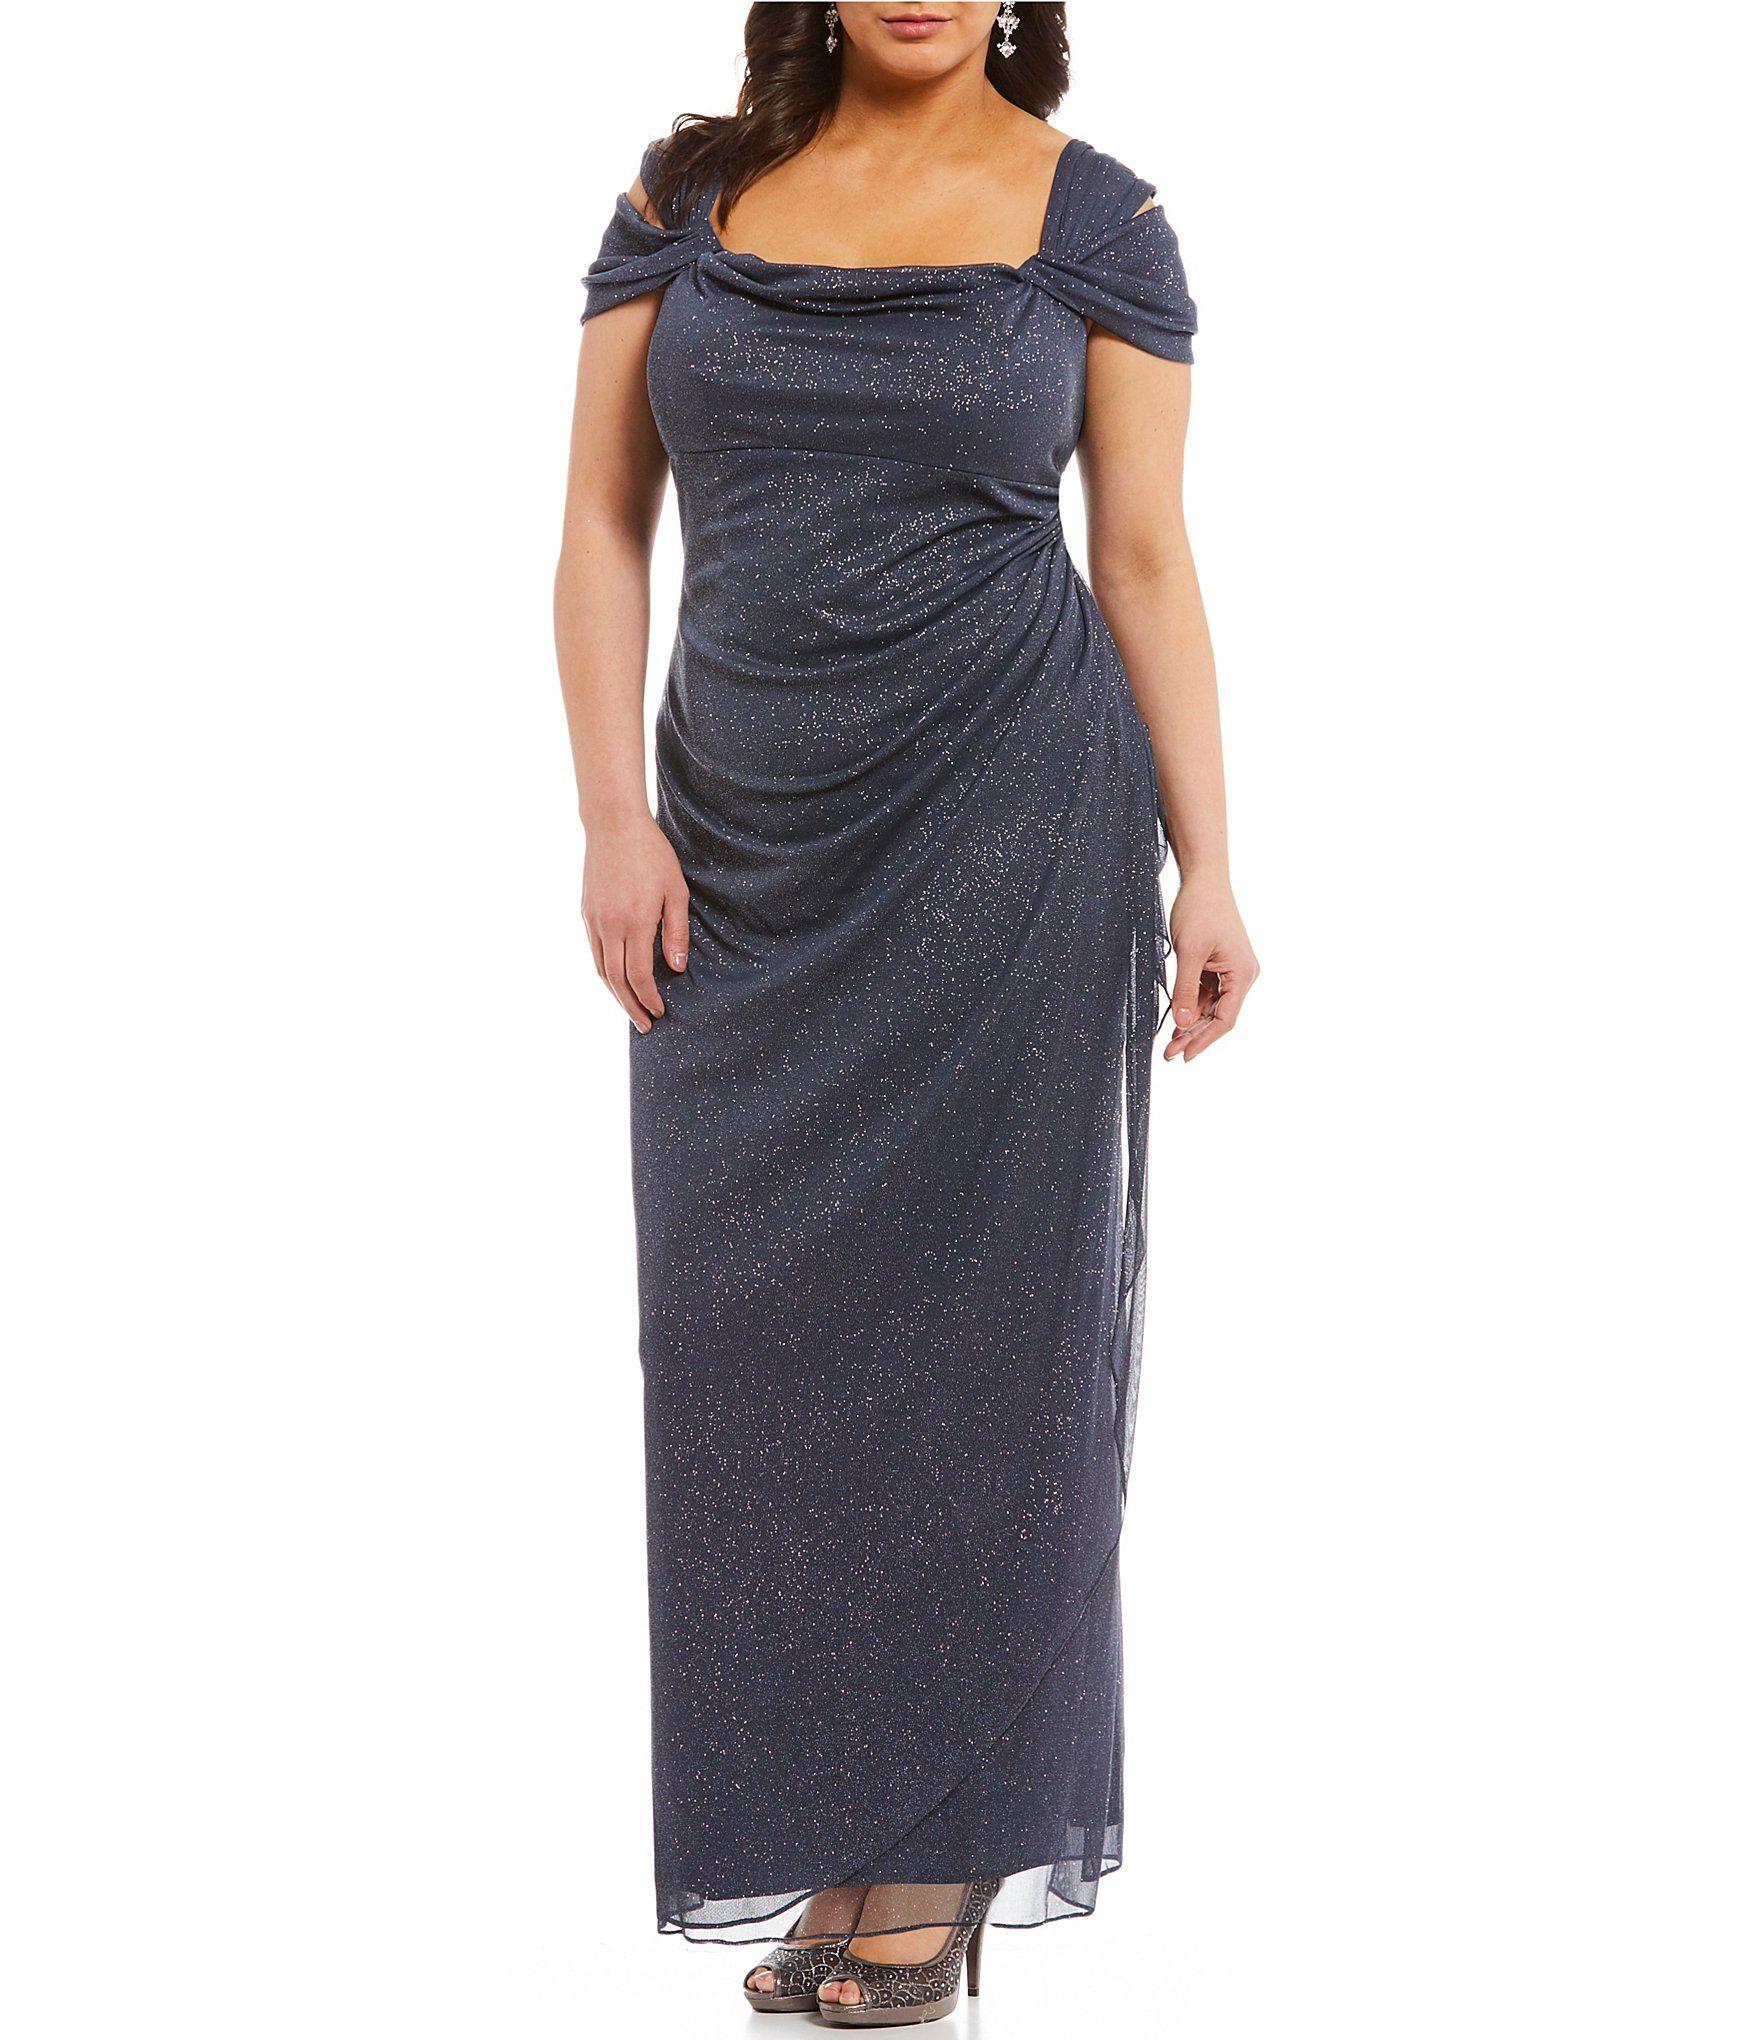 4d1aef8a05f Plus Size Formal Dresses Dillards - Gomes Weine AG